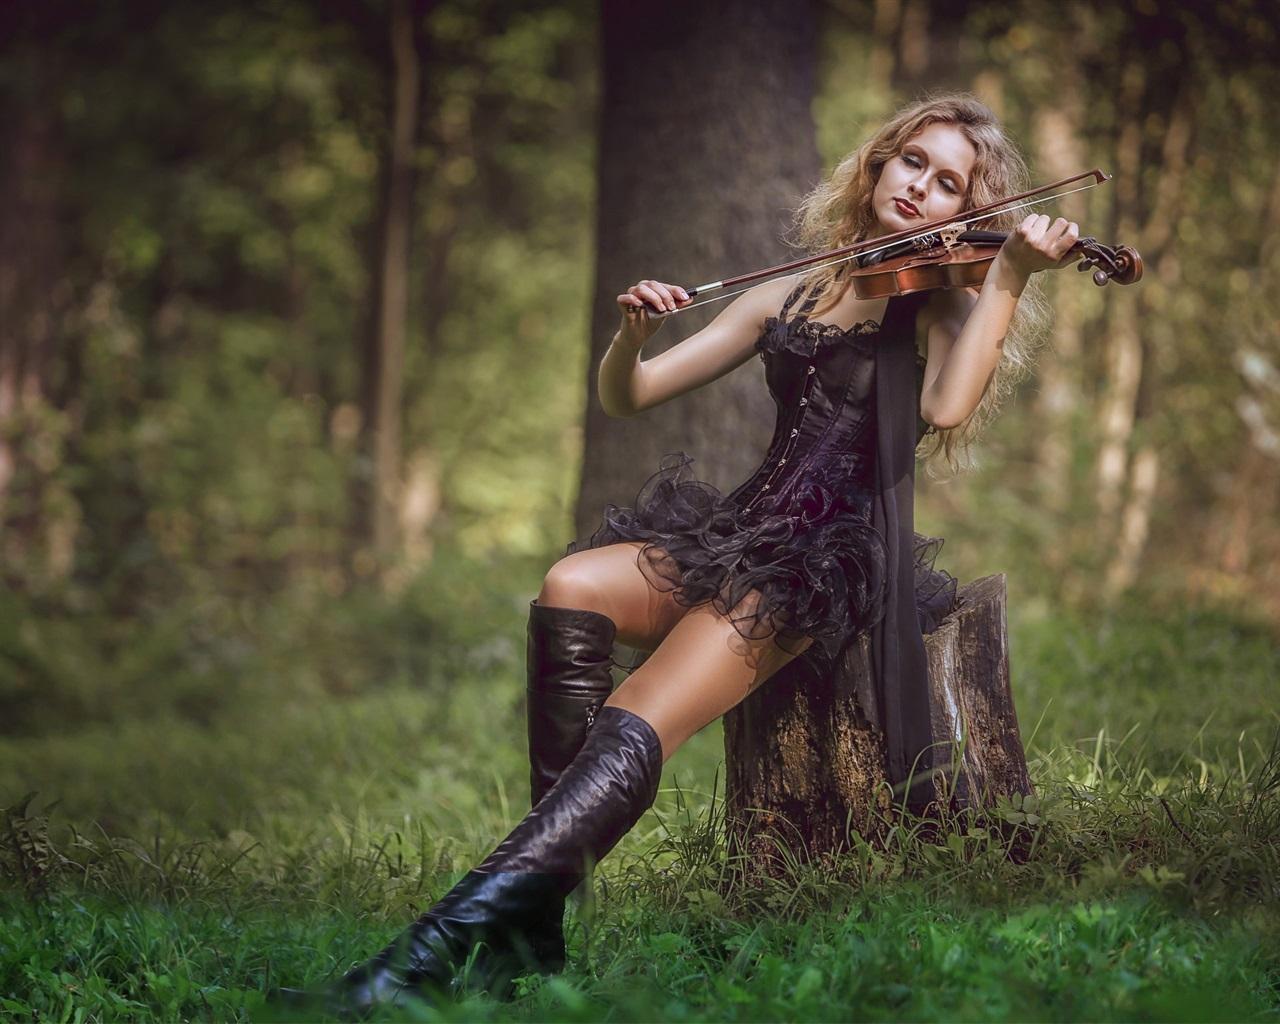 wallpaper black skirt girl play violin in forest 2560x1440